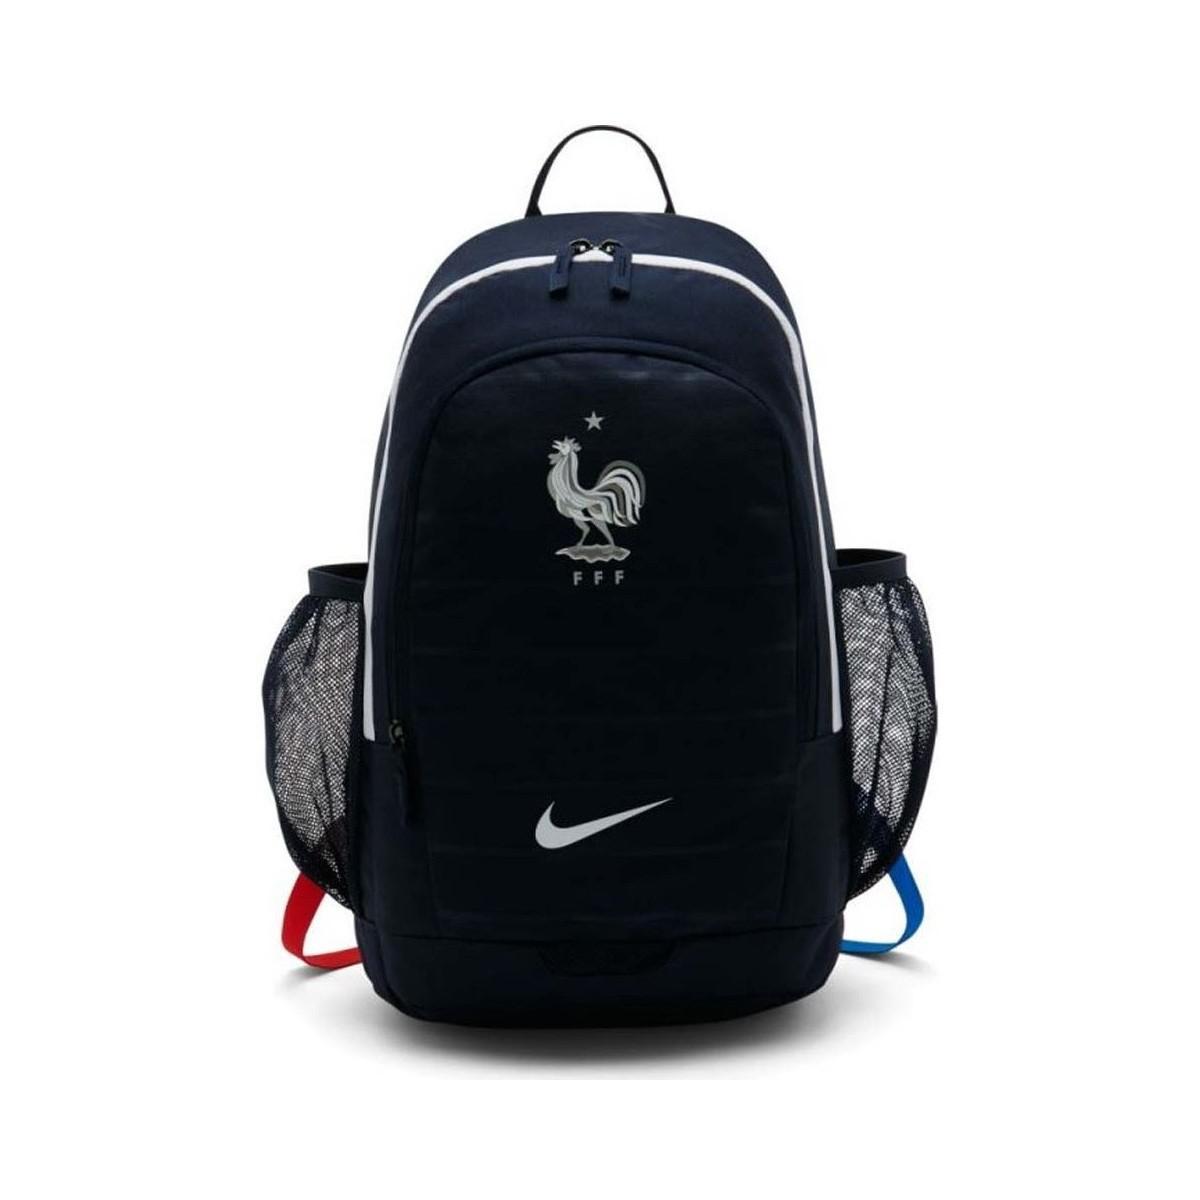 c8cb27d7a647 Nike 2018-2019 France Nk Stadiumpack (obsidian) Women s Backpack In ...